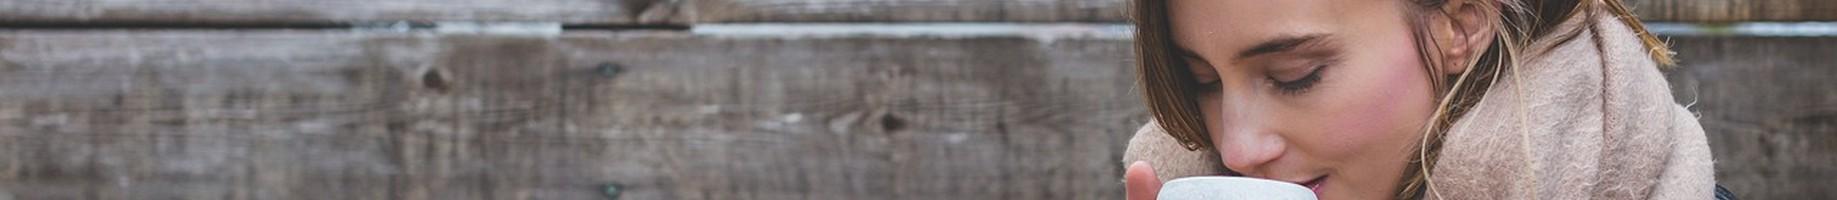 wooden-2557549_1280